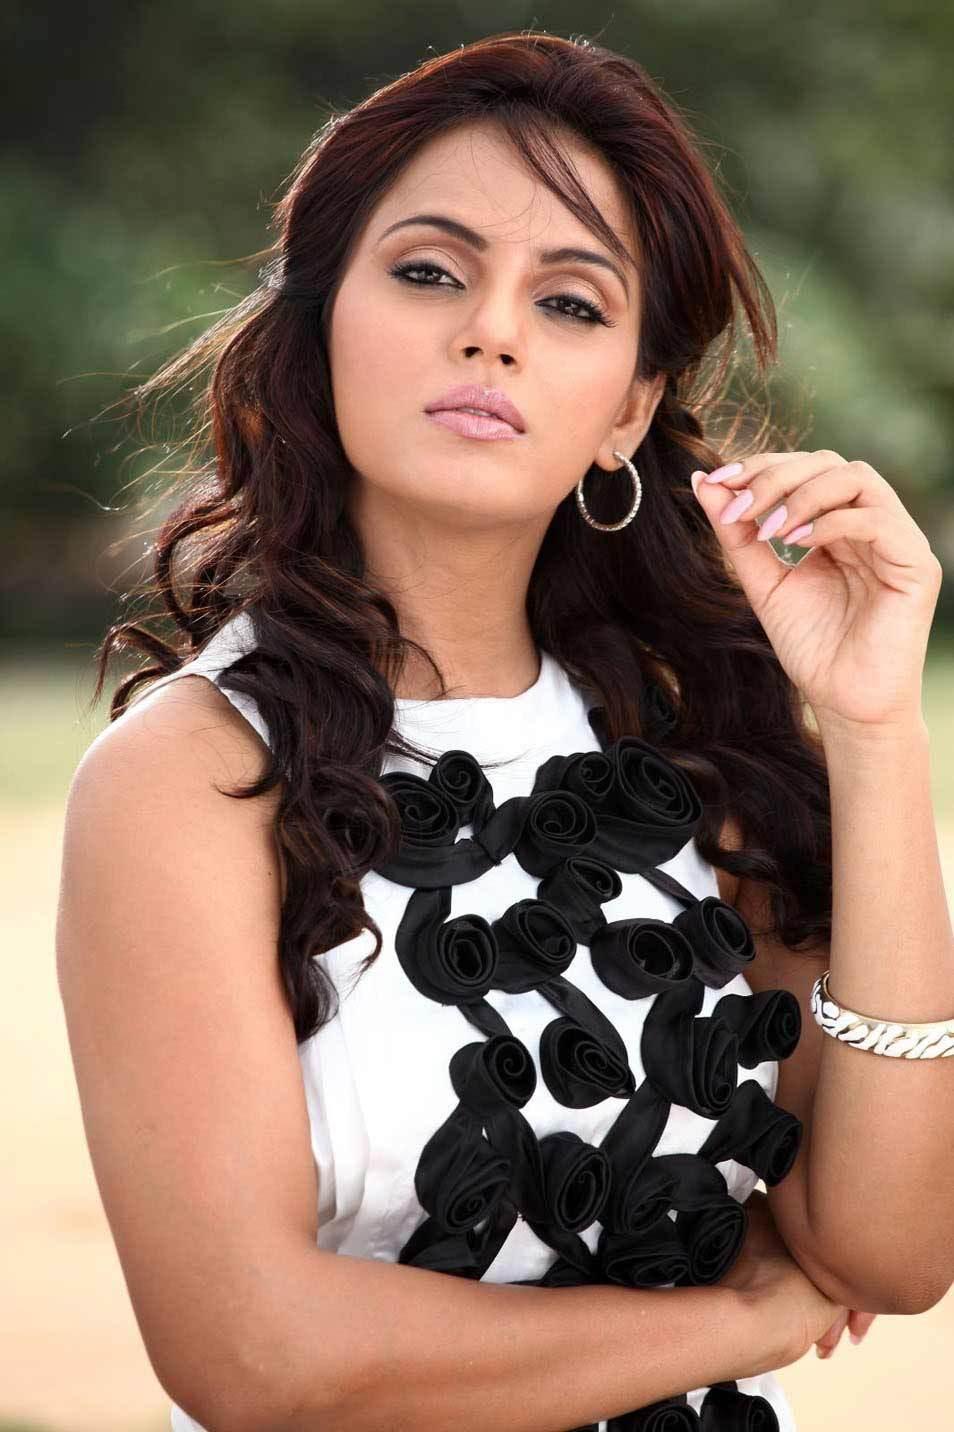 Scenic Neetu Chandra Hot Navel In Shorts Pics Photoshoots